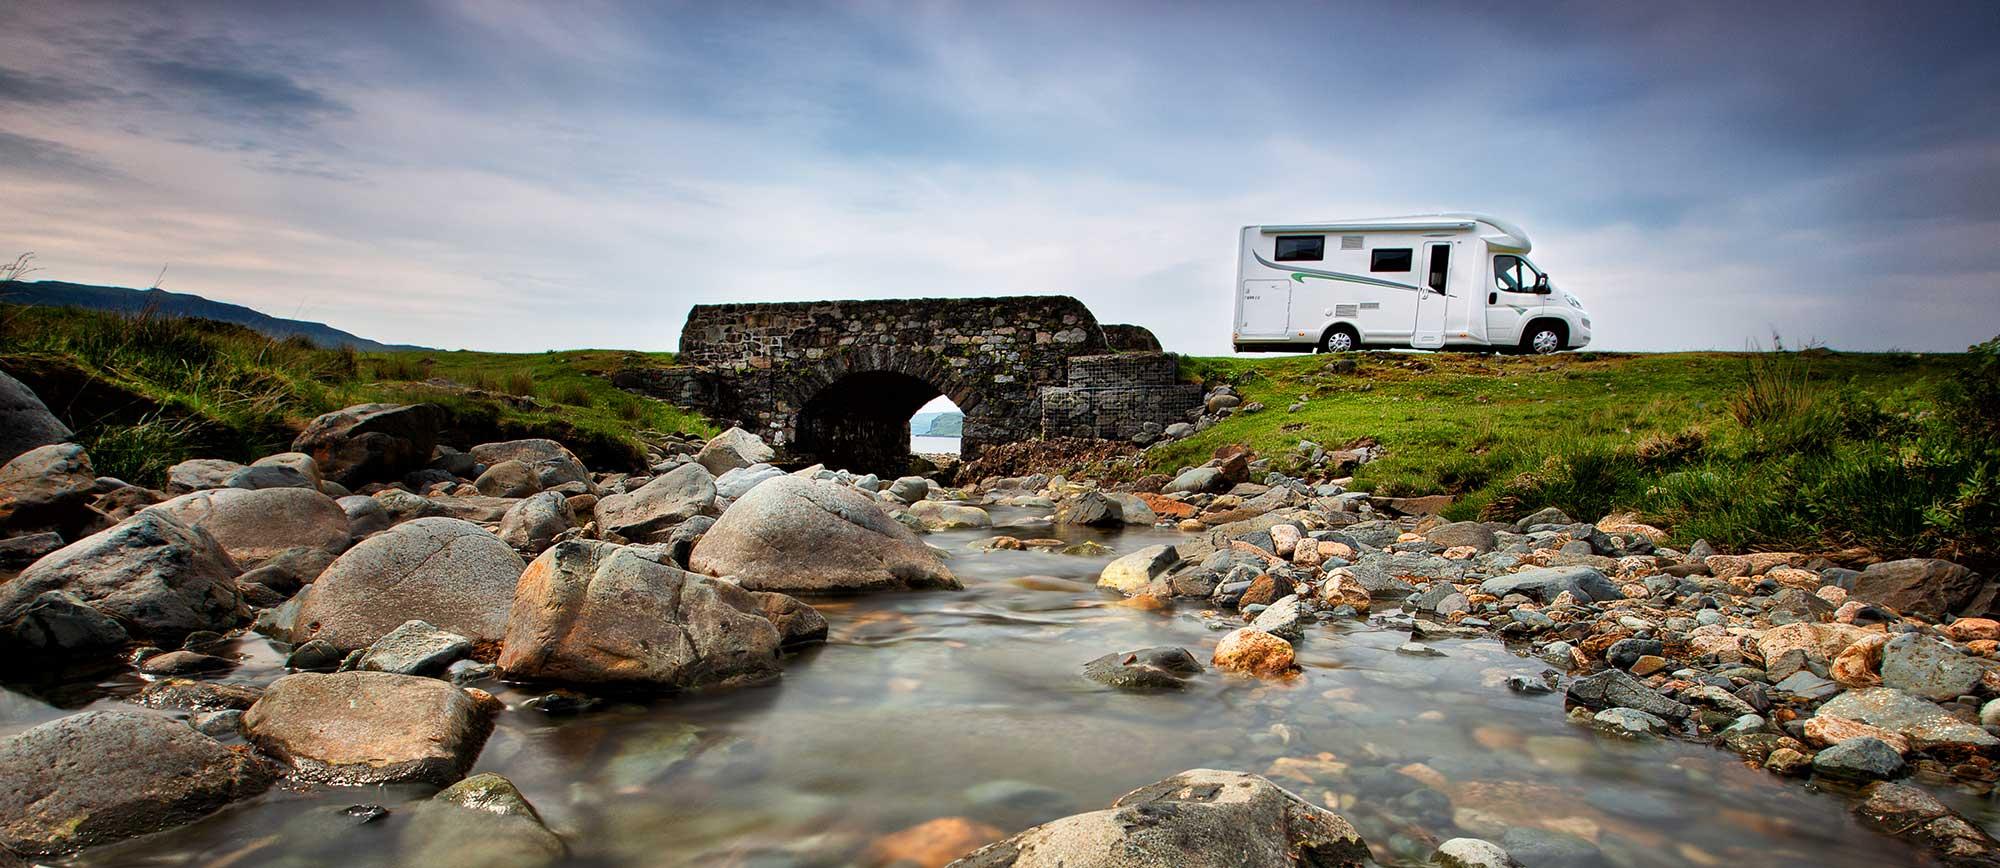 Forster Wohnmobile - Unterwegs in Schottland